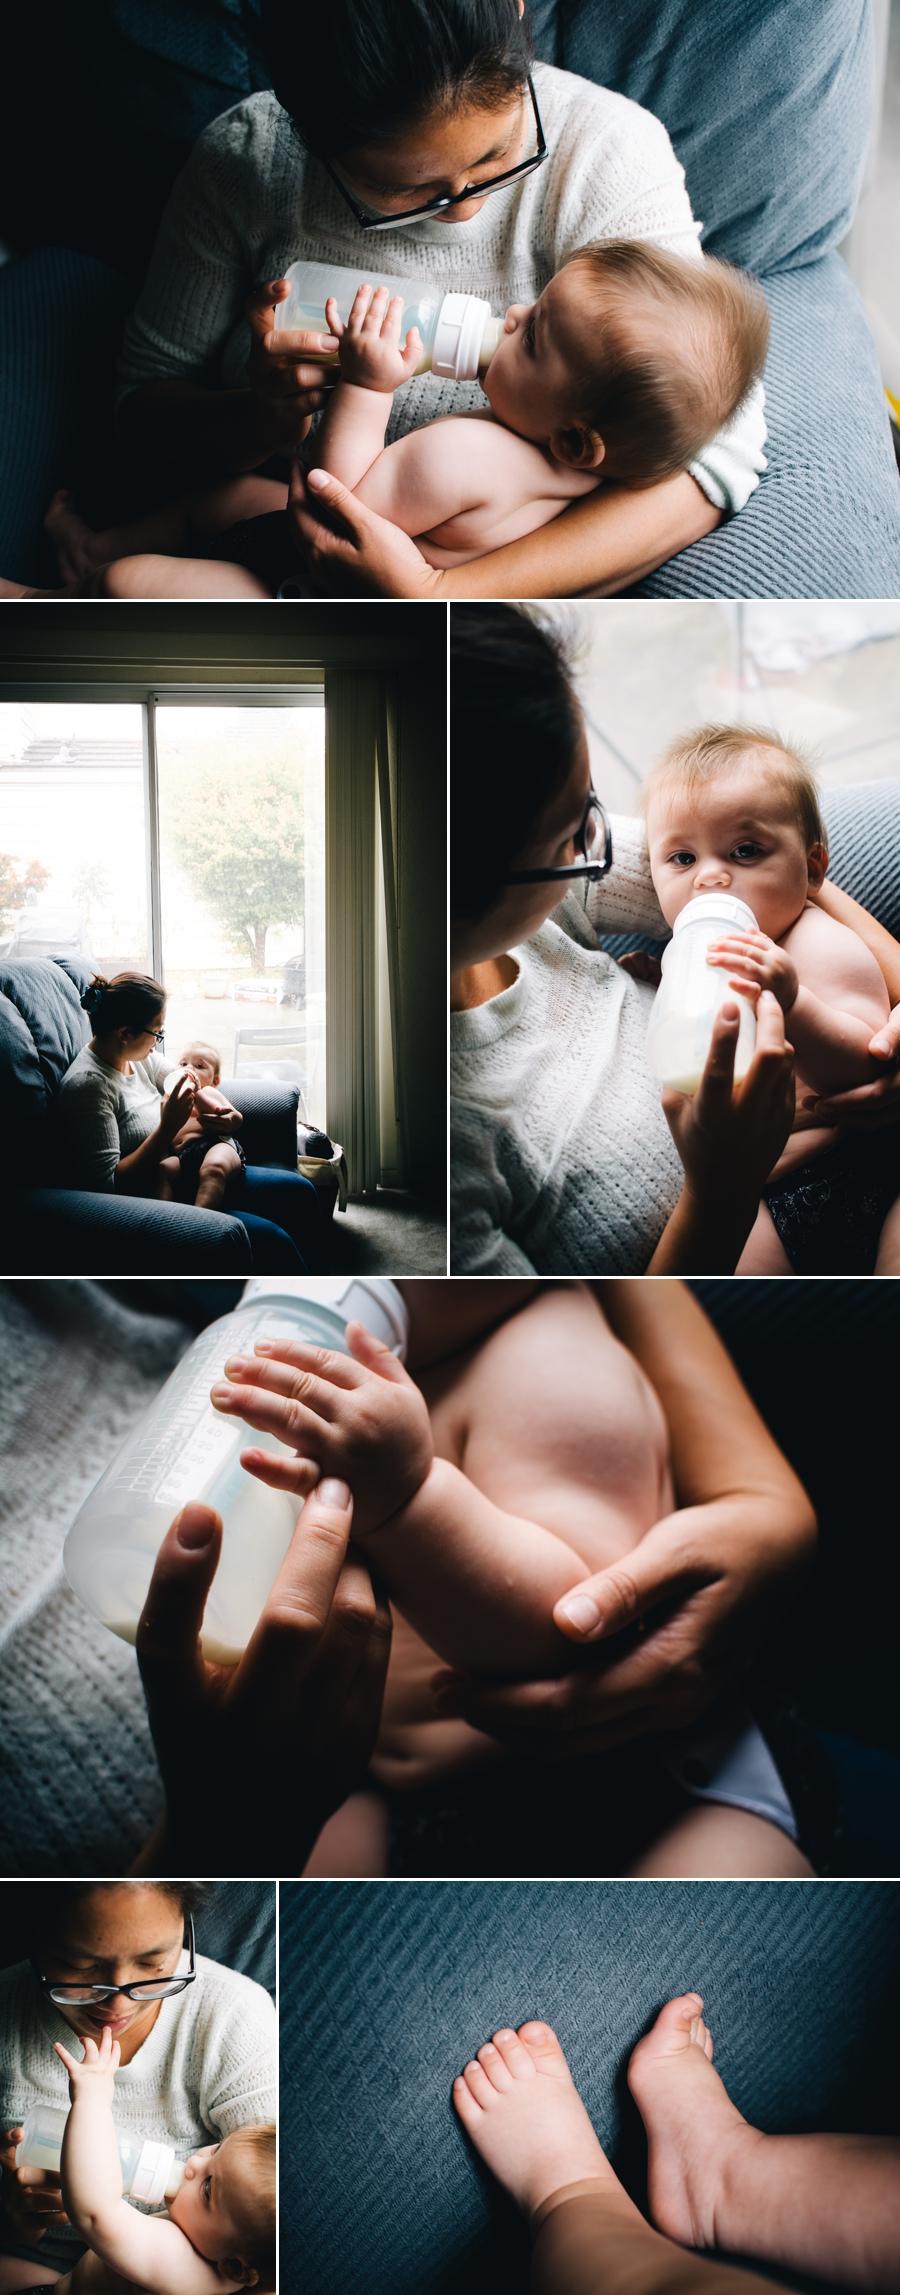 baby-gordon-leonard-6